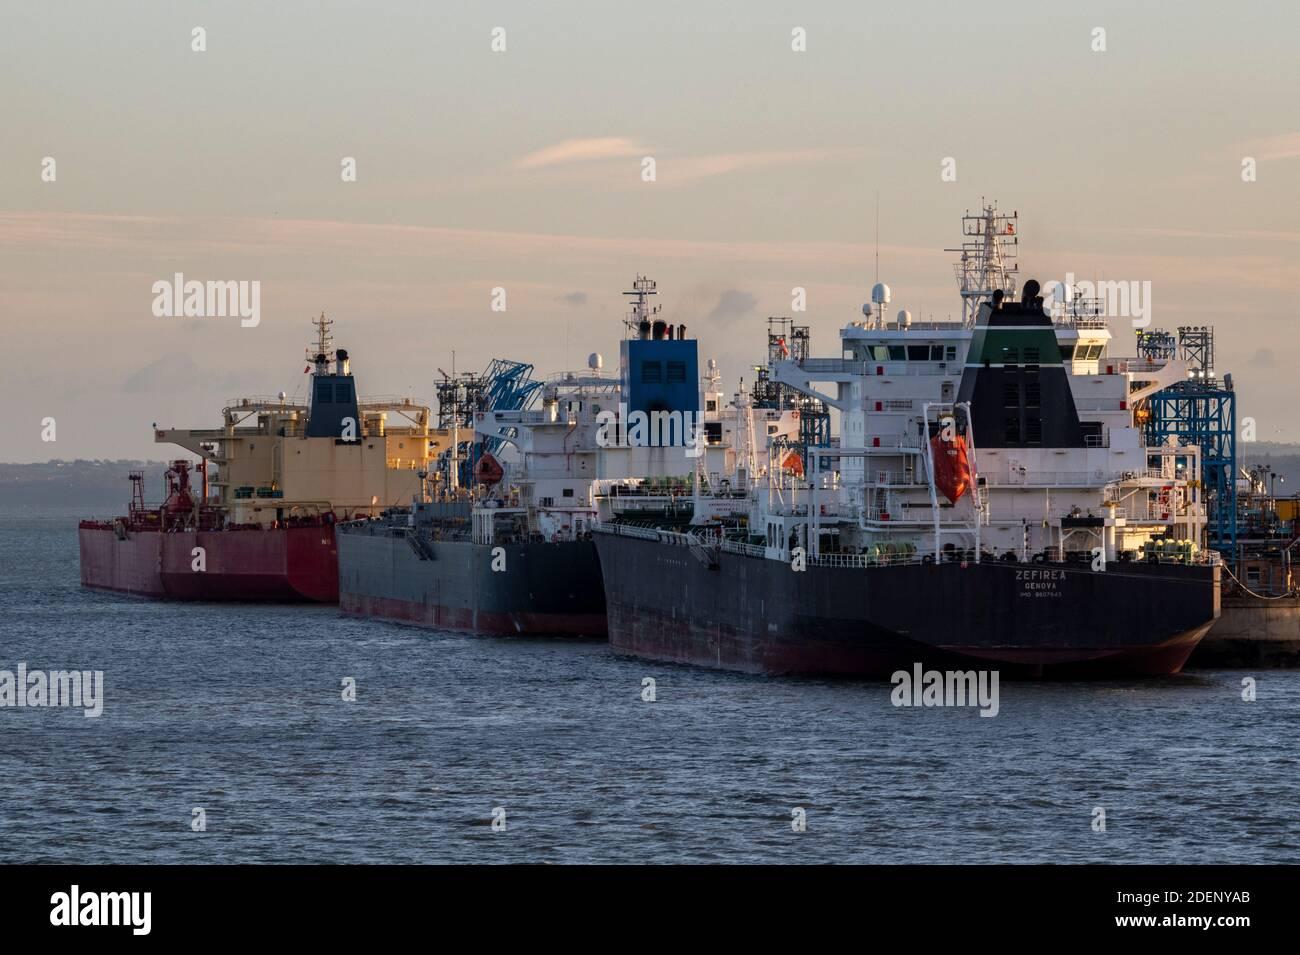 oil takers alongside at the fawley oil refinery on southampton water, southampton docks, uk Stock Photo